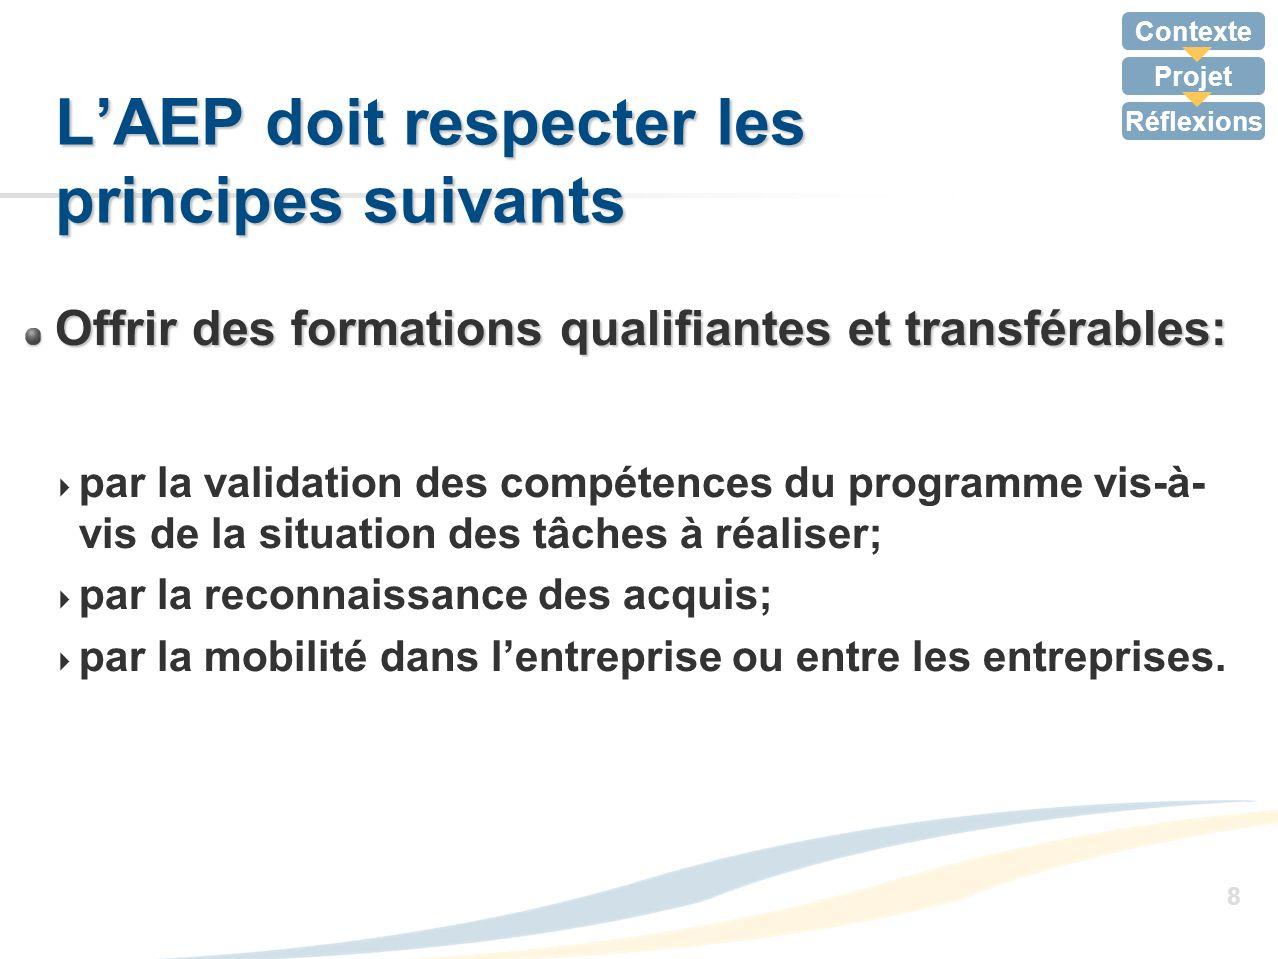 L'AEP doit respecter les principes suivants